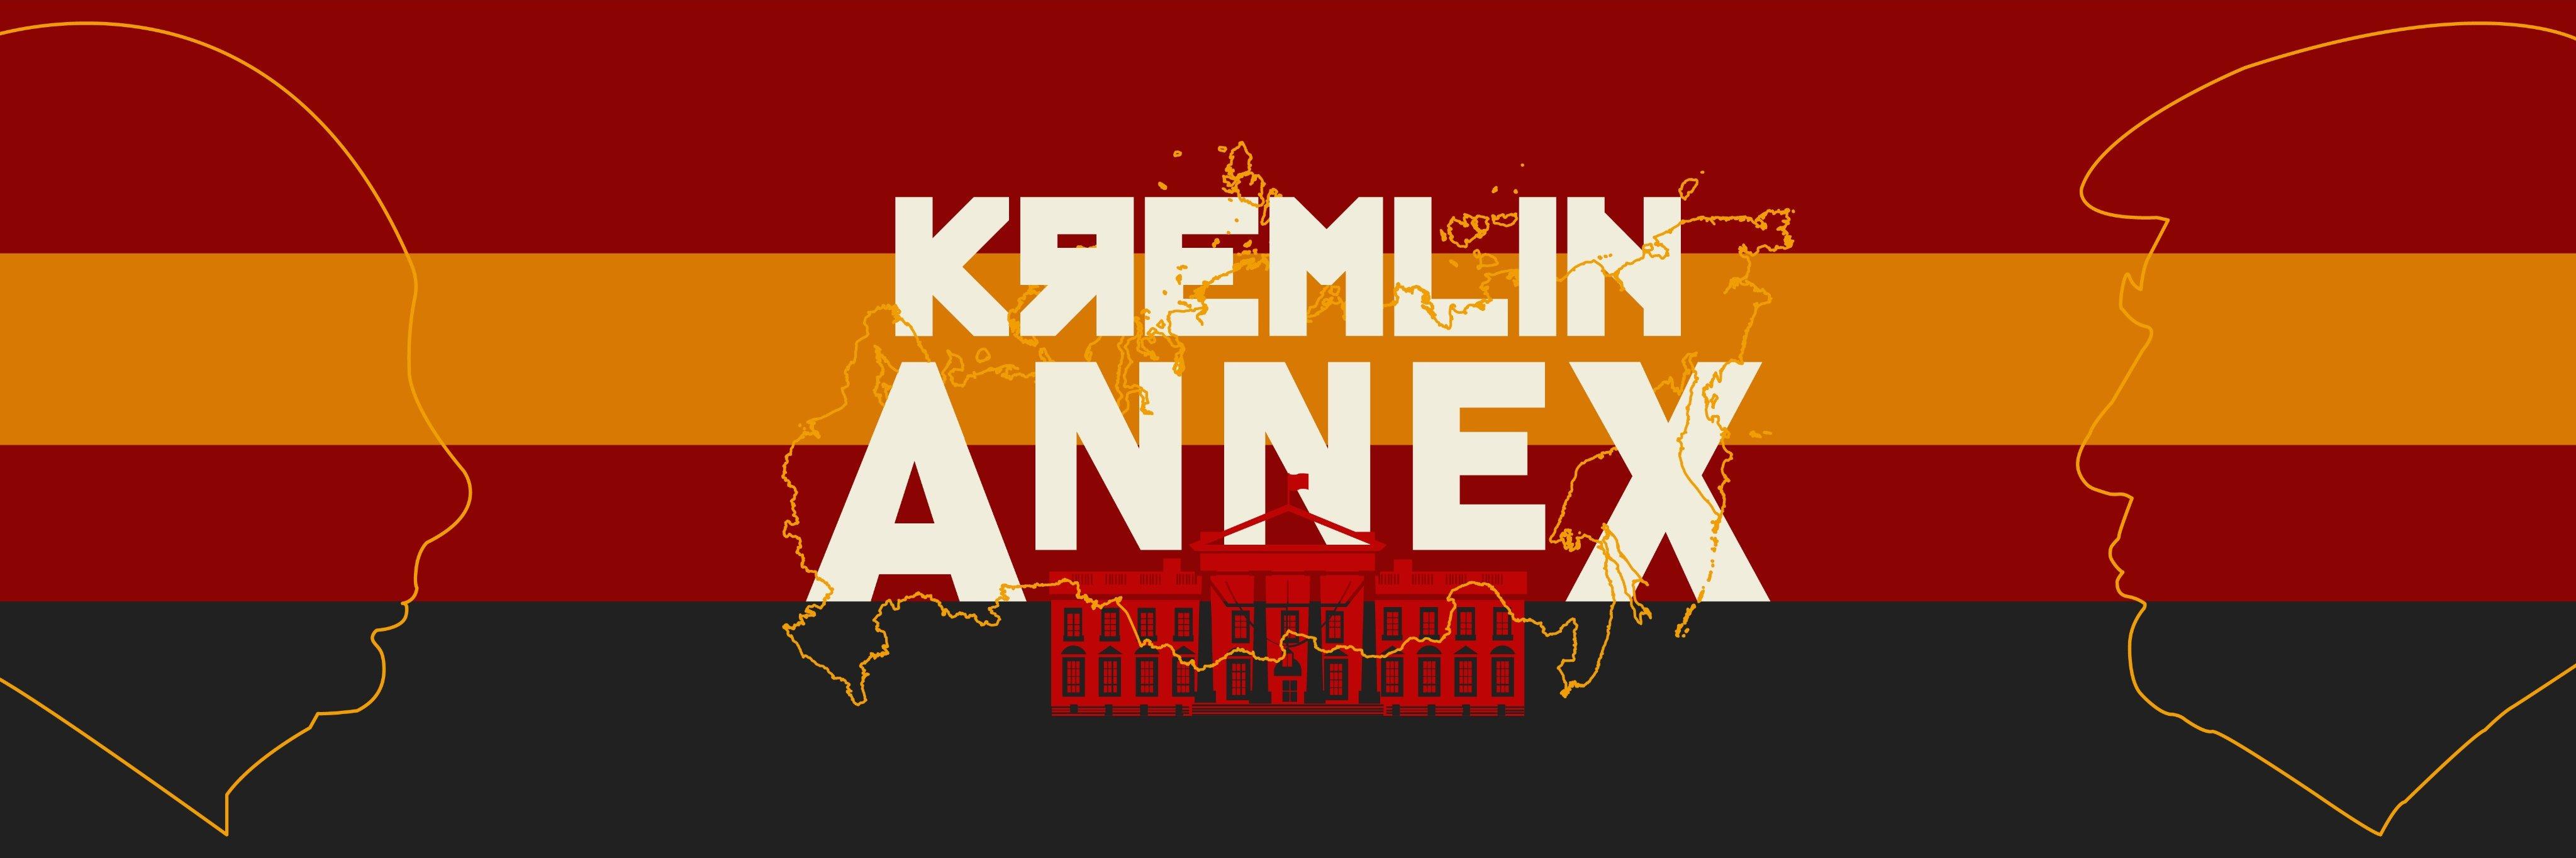 ACQUITTED, NOT EXONERATED! Join #KremlinAnnex protests! @KremlinAnnex ✌️🇺🇸 Our schedule: KremlinAnnex.org https://t.co/EYTxDHPPuF